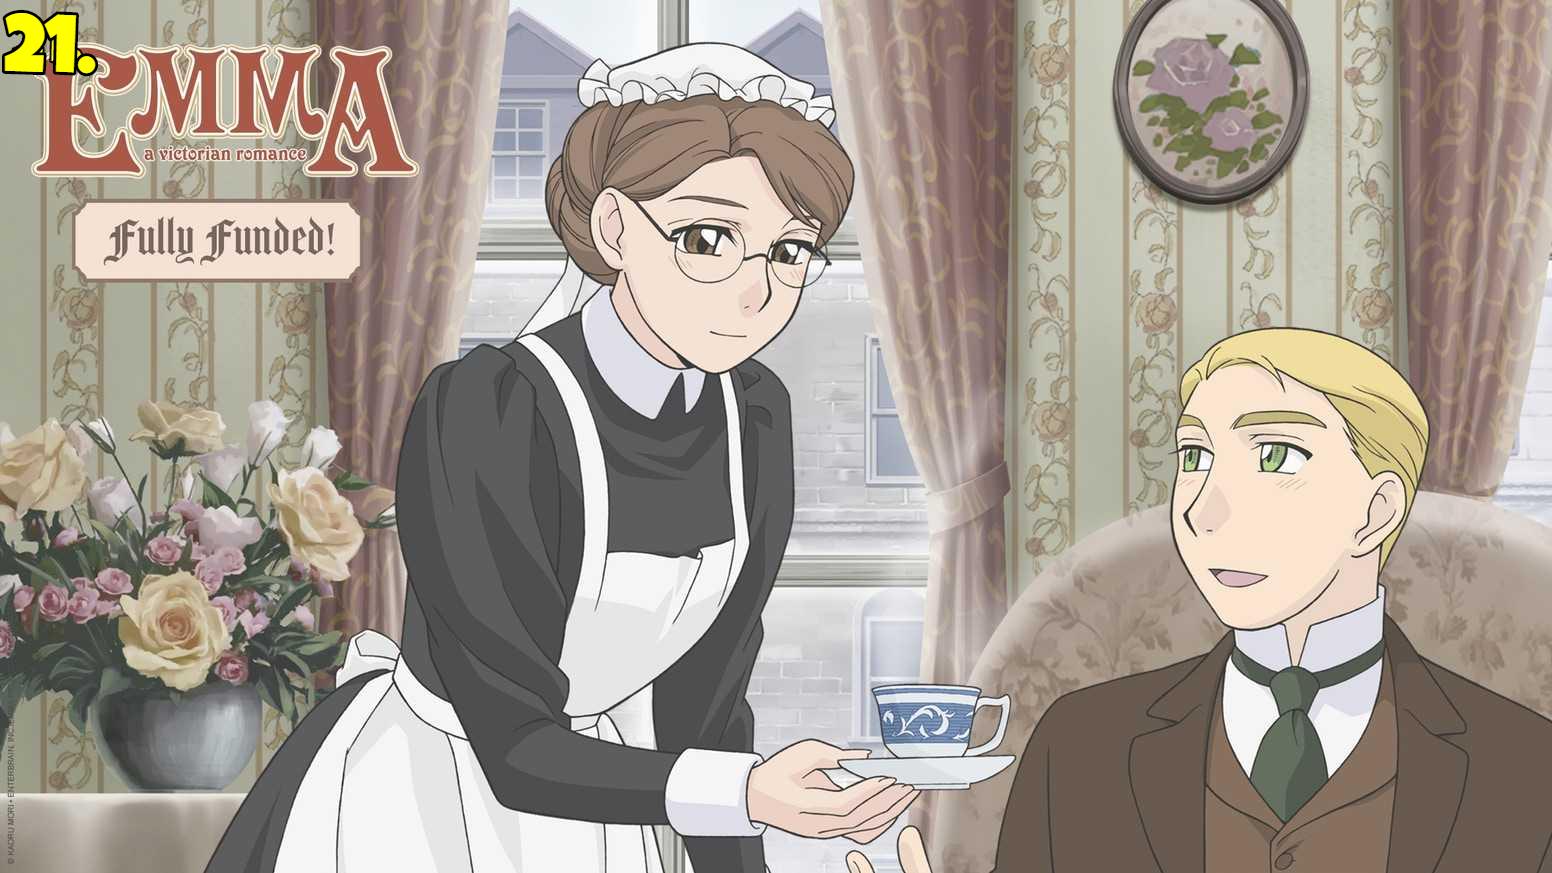 Emma-A Victorian Romance